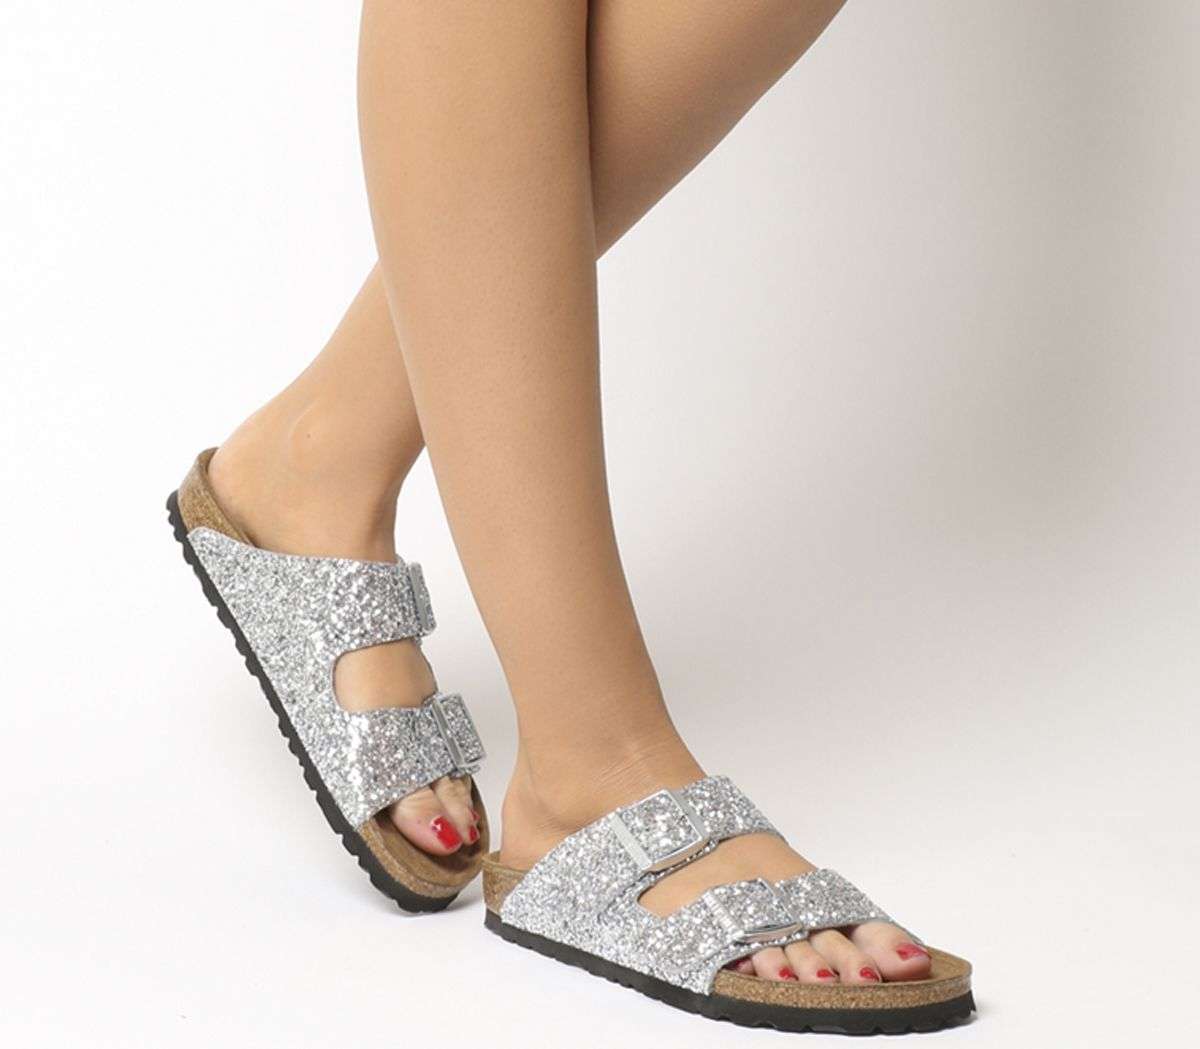 5687da4a0d4a Birkenstock Arizona Two Strap Sandals Oc Glitter Silver - Sandals